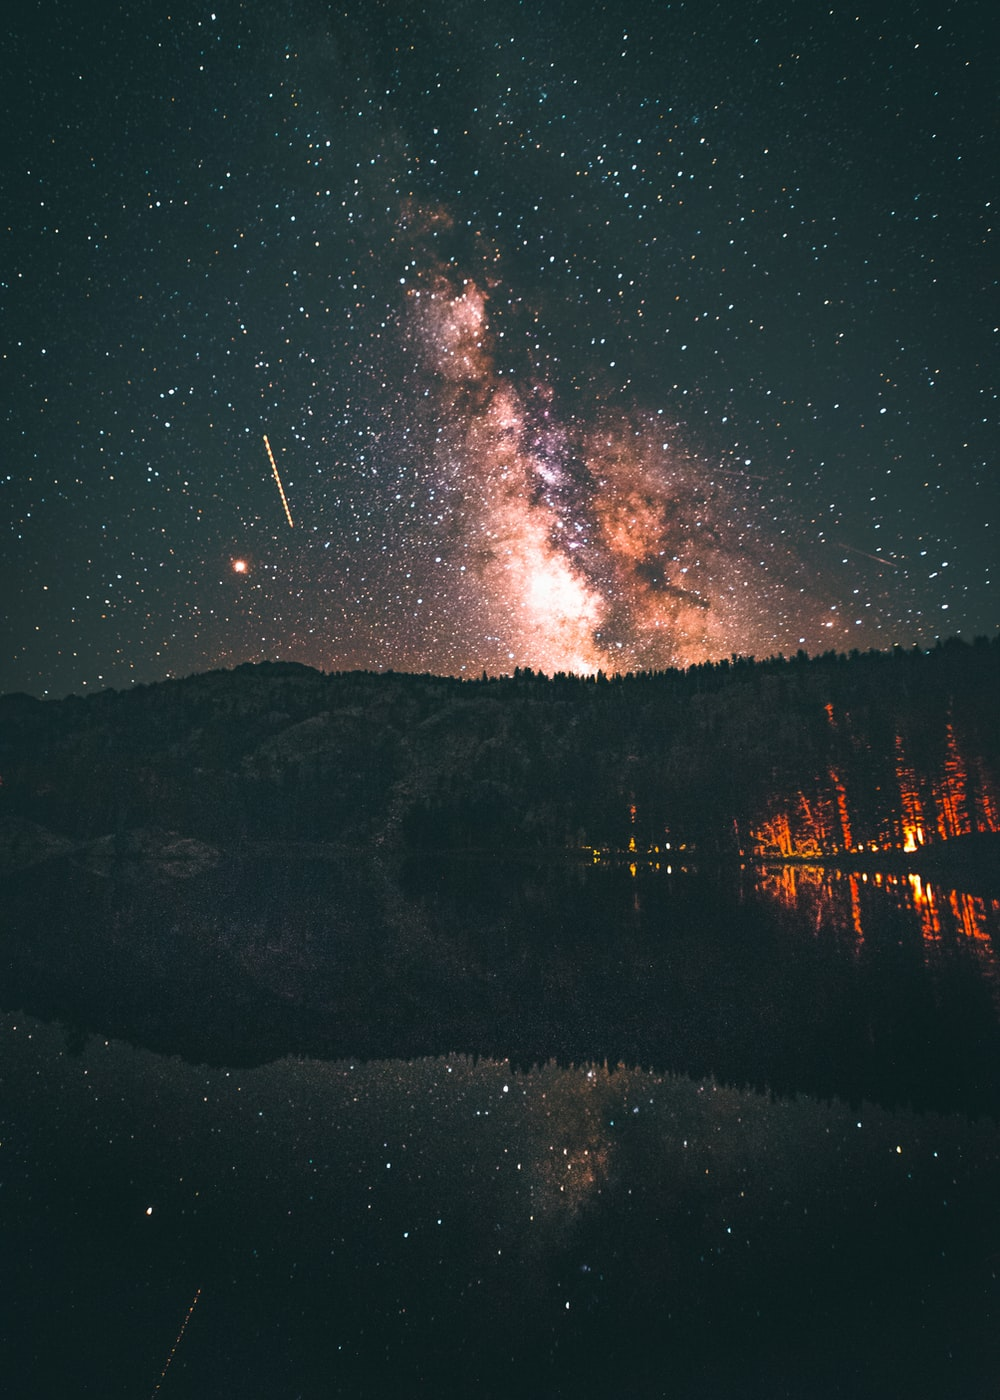 sky phenomenon above pine trees near body of water